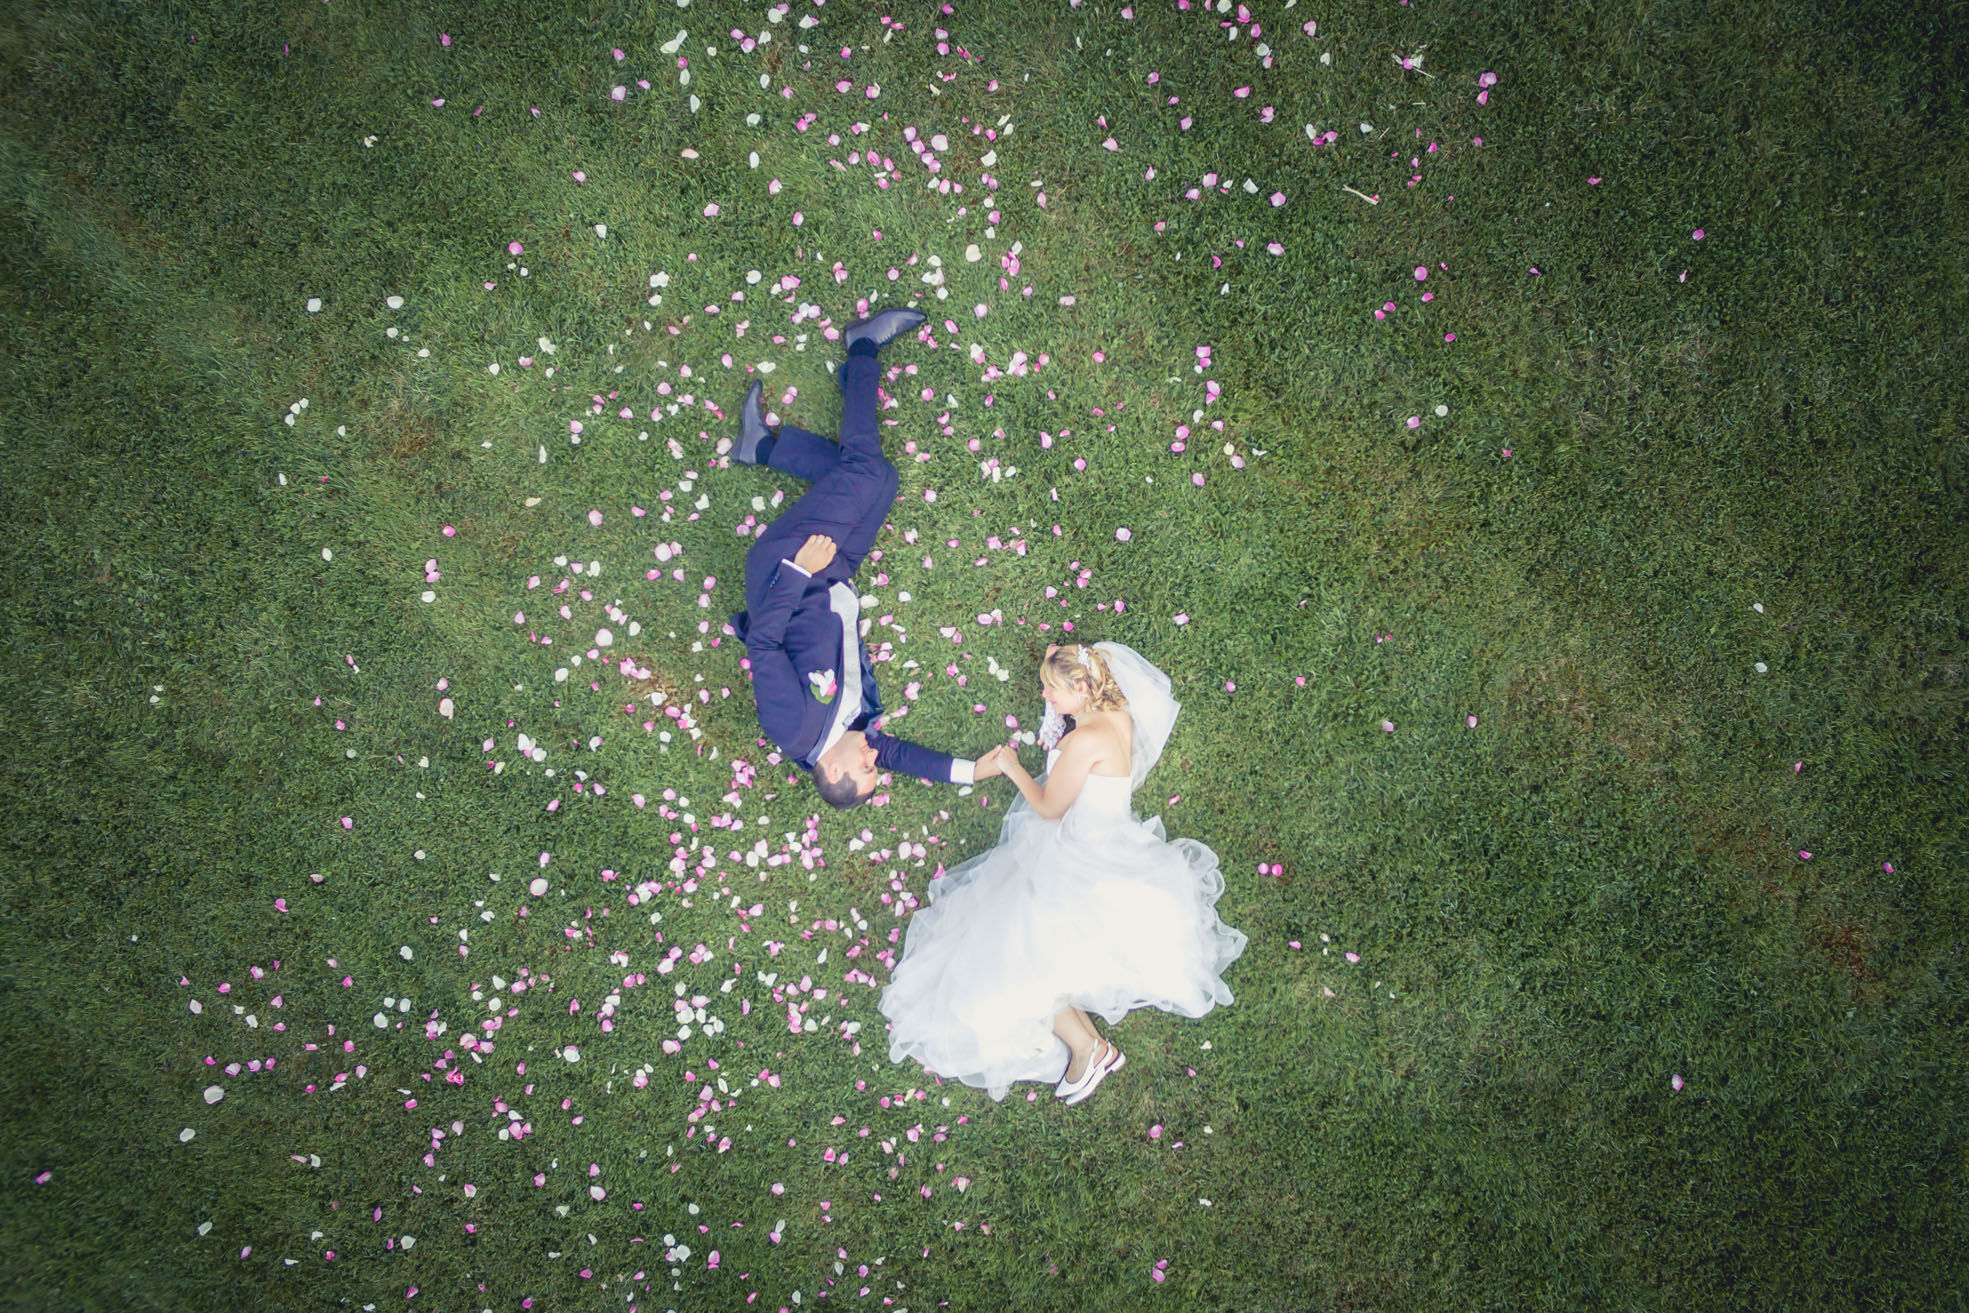 drone photo mariage, photographe mariage ile de france, photographe mariage paris, photographe mariage 78, photographe professionnel IDF, Jean-Baptiste Chauvin Photographe, exploitant professionnel de drône, www.studioart-photographe.Fr